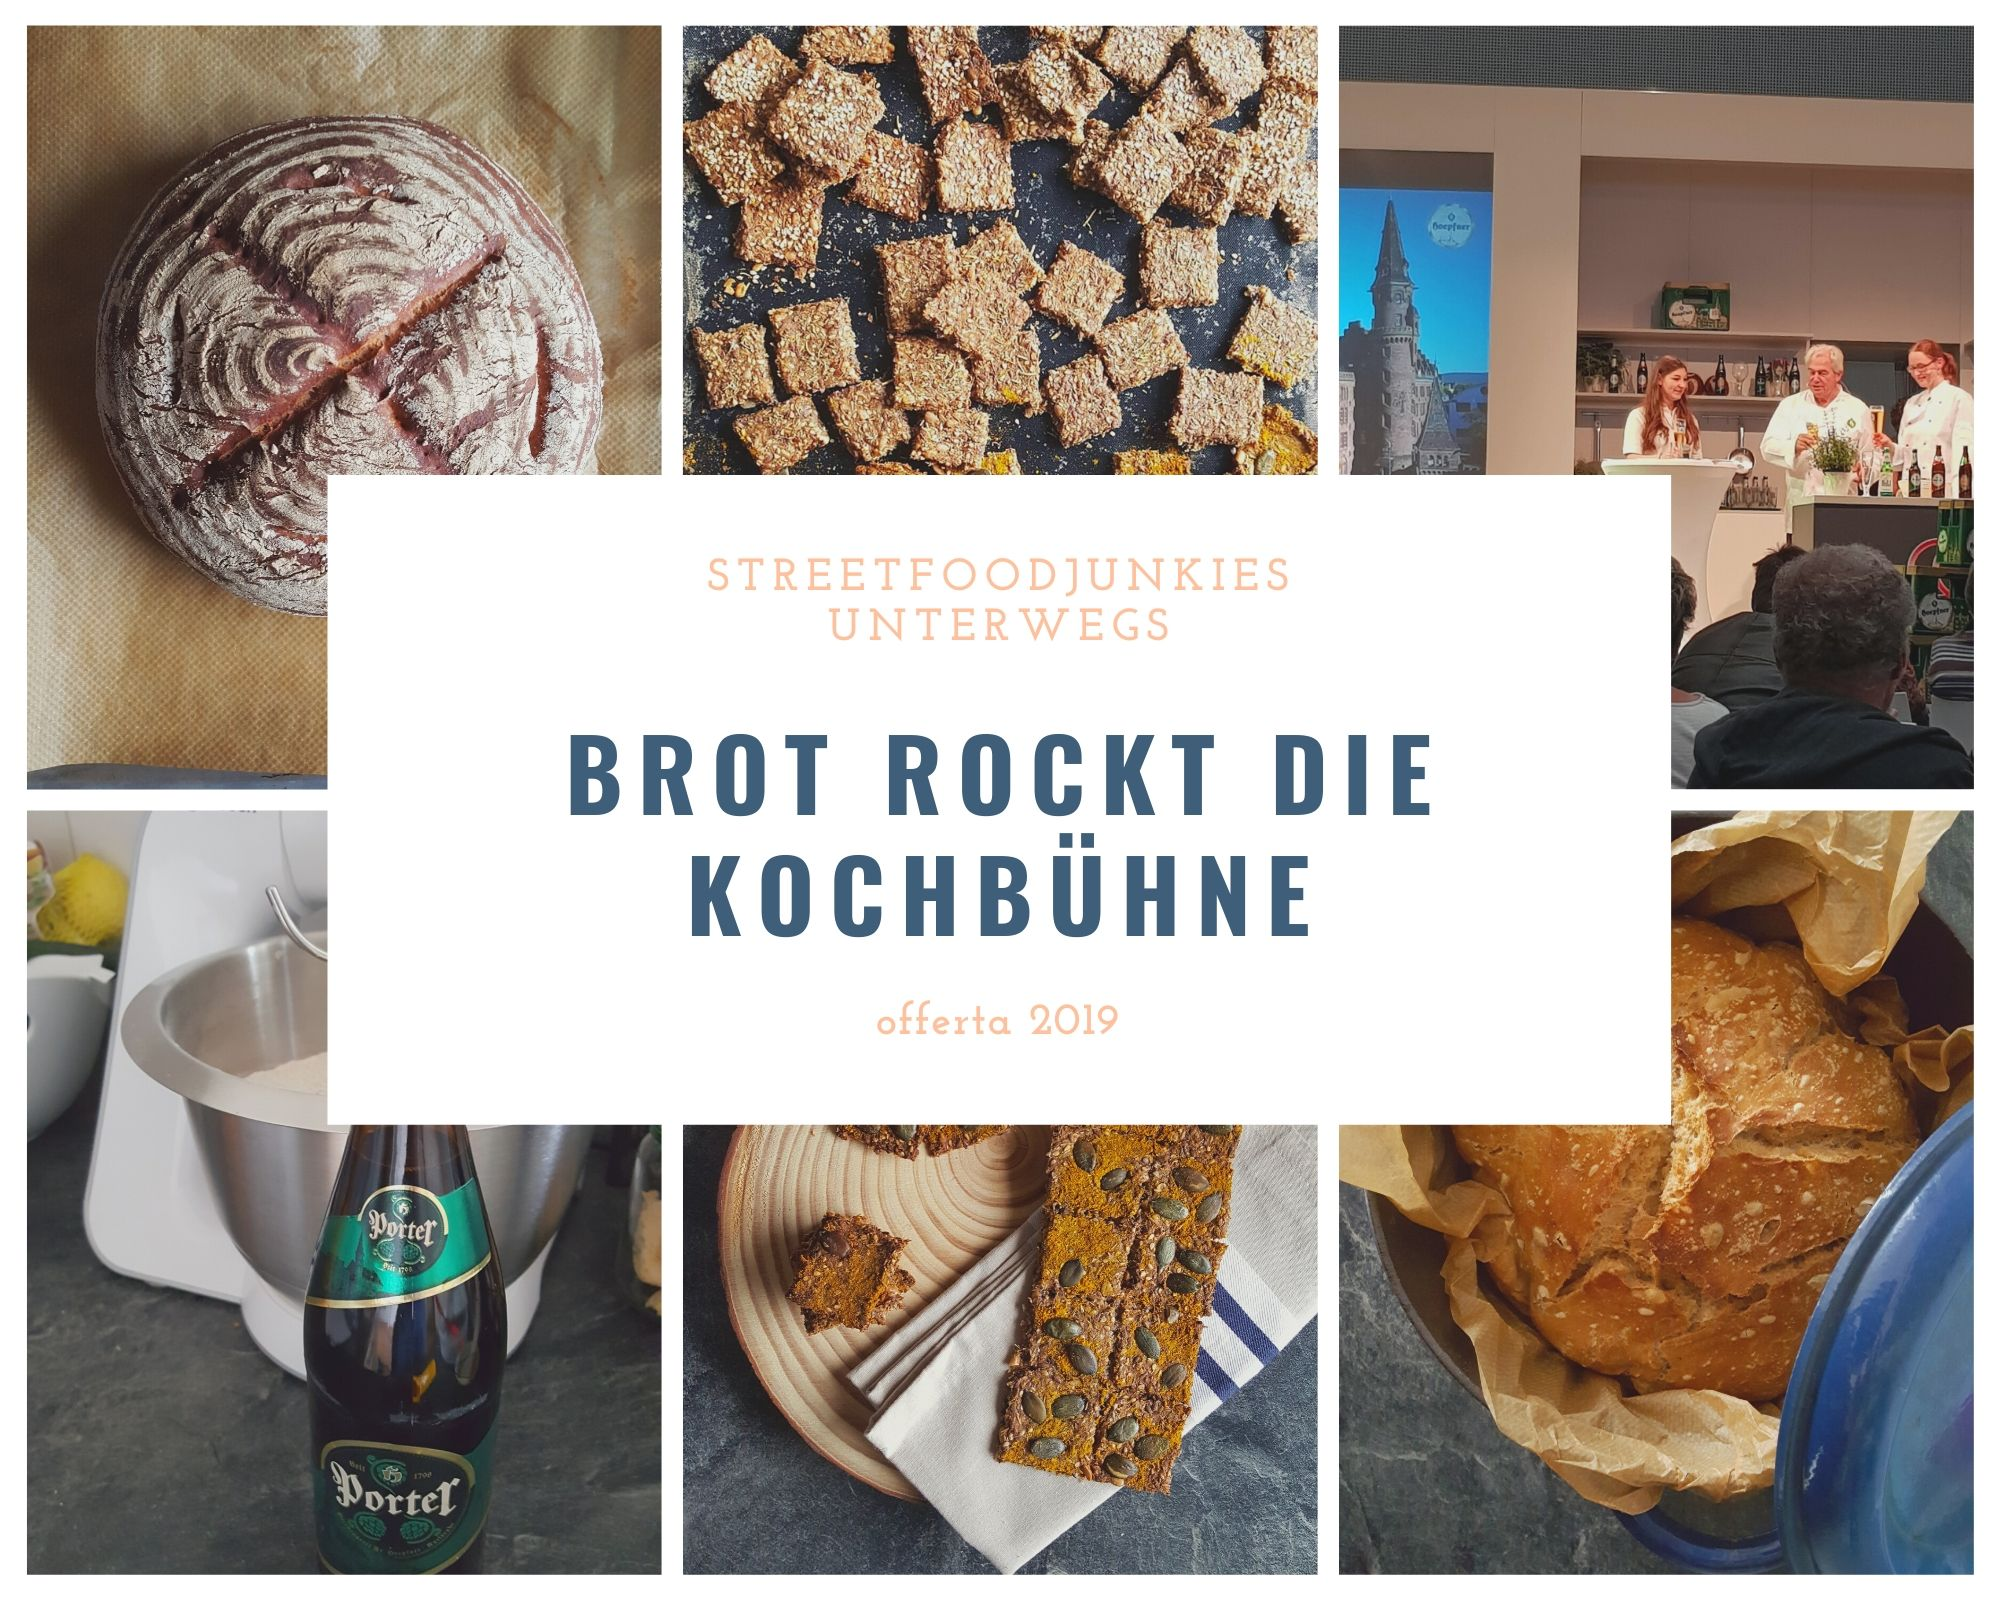 Streetfoodjunkies-offerta-2019-Kochbuehne-Brot.jpg